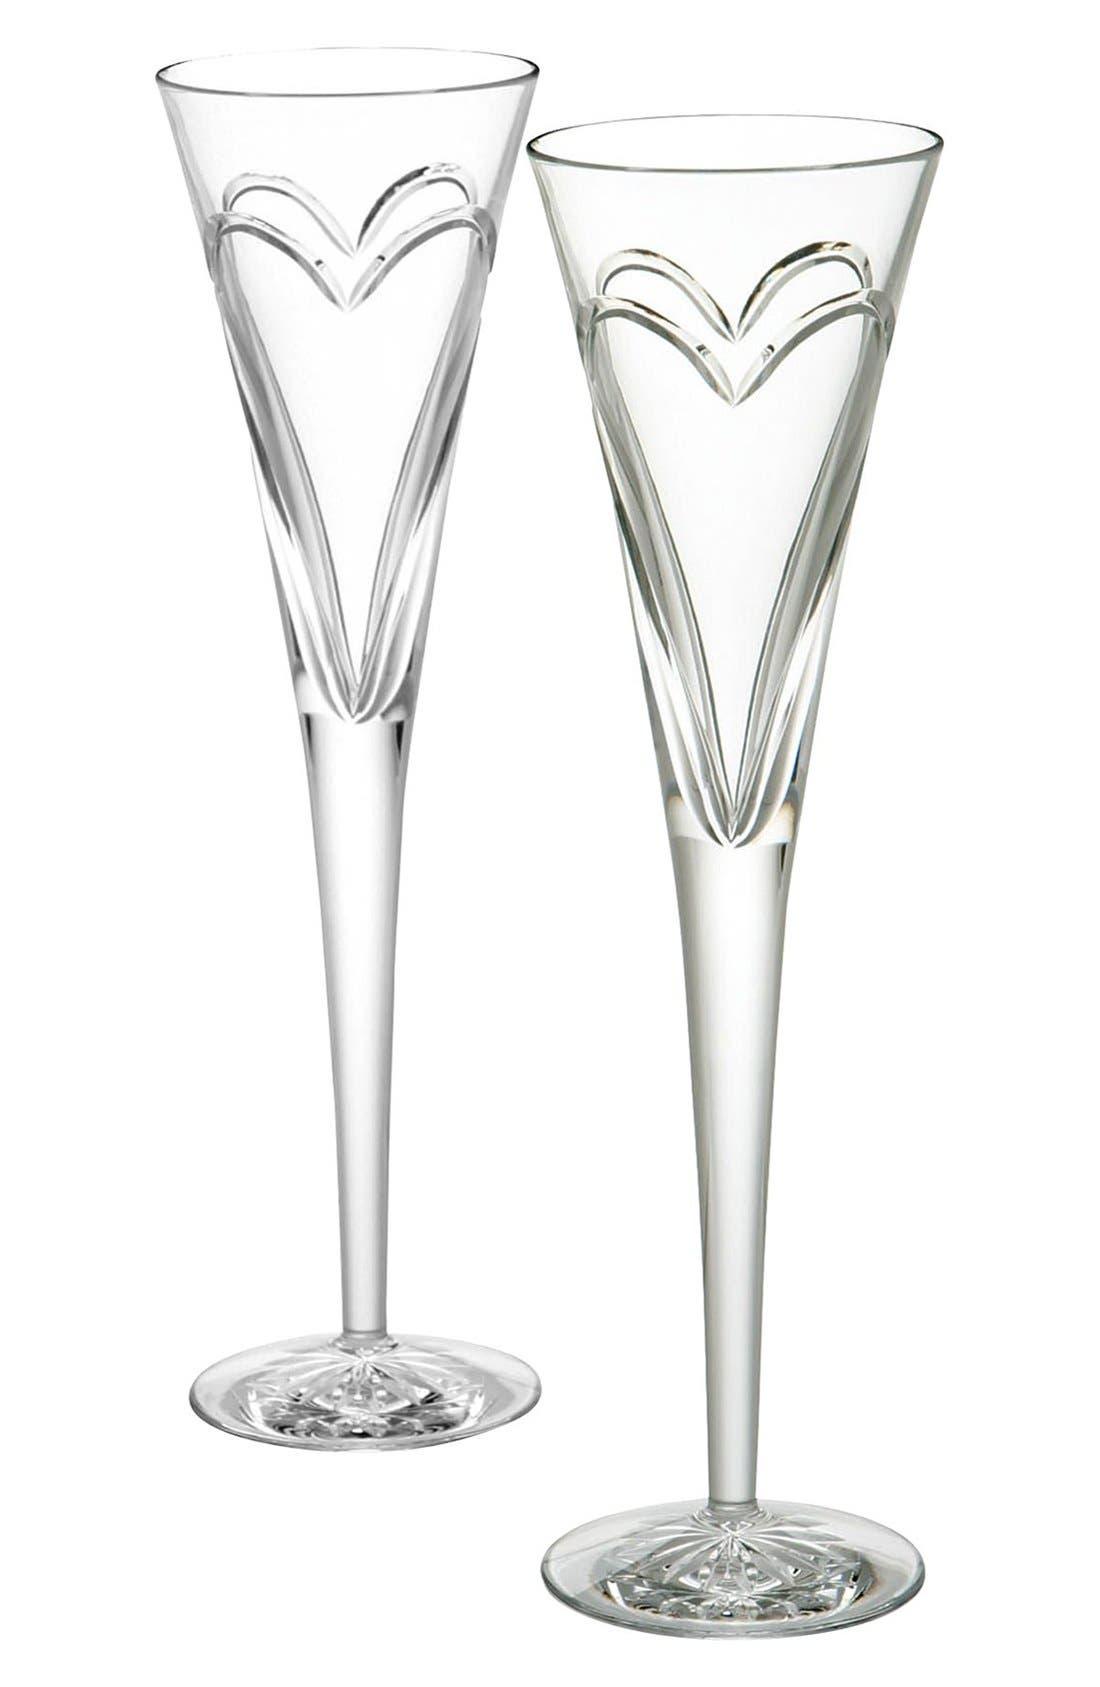 waterford u0027wishes love u0026 lead crystal champagne flutes - Waterford Champagne Flutes